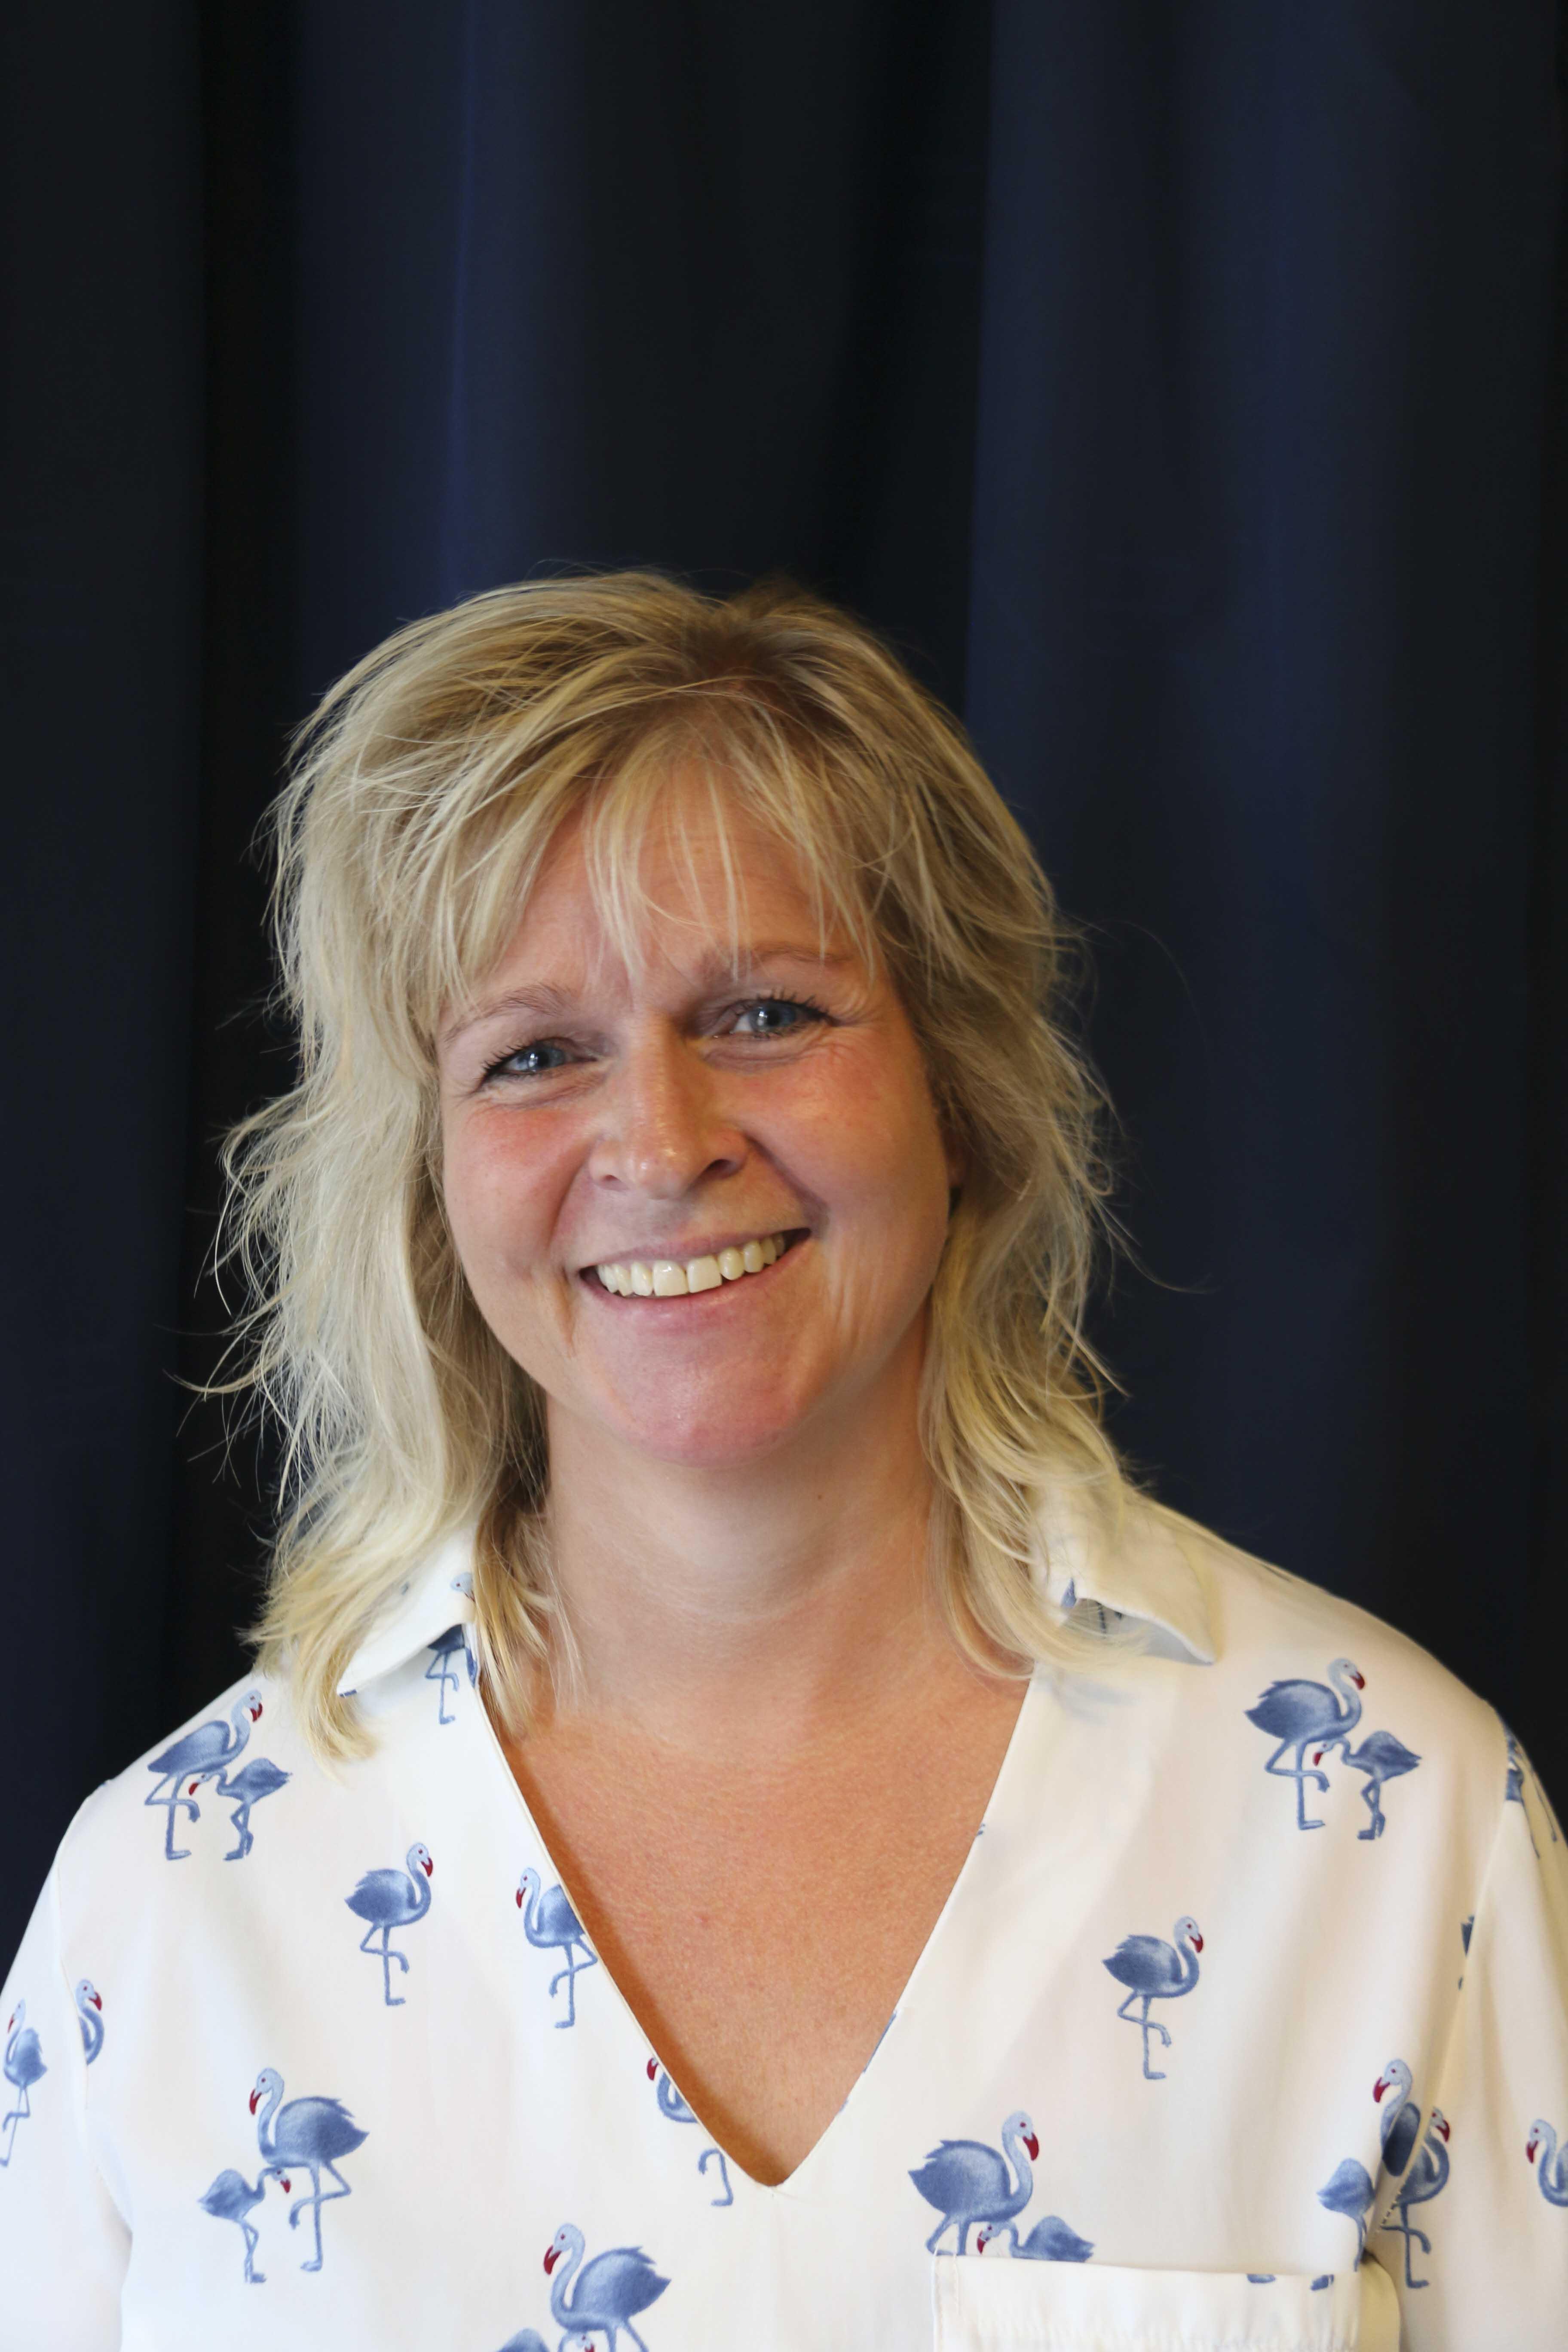 Christa Boekhorst